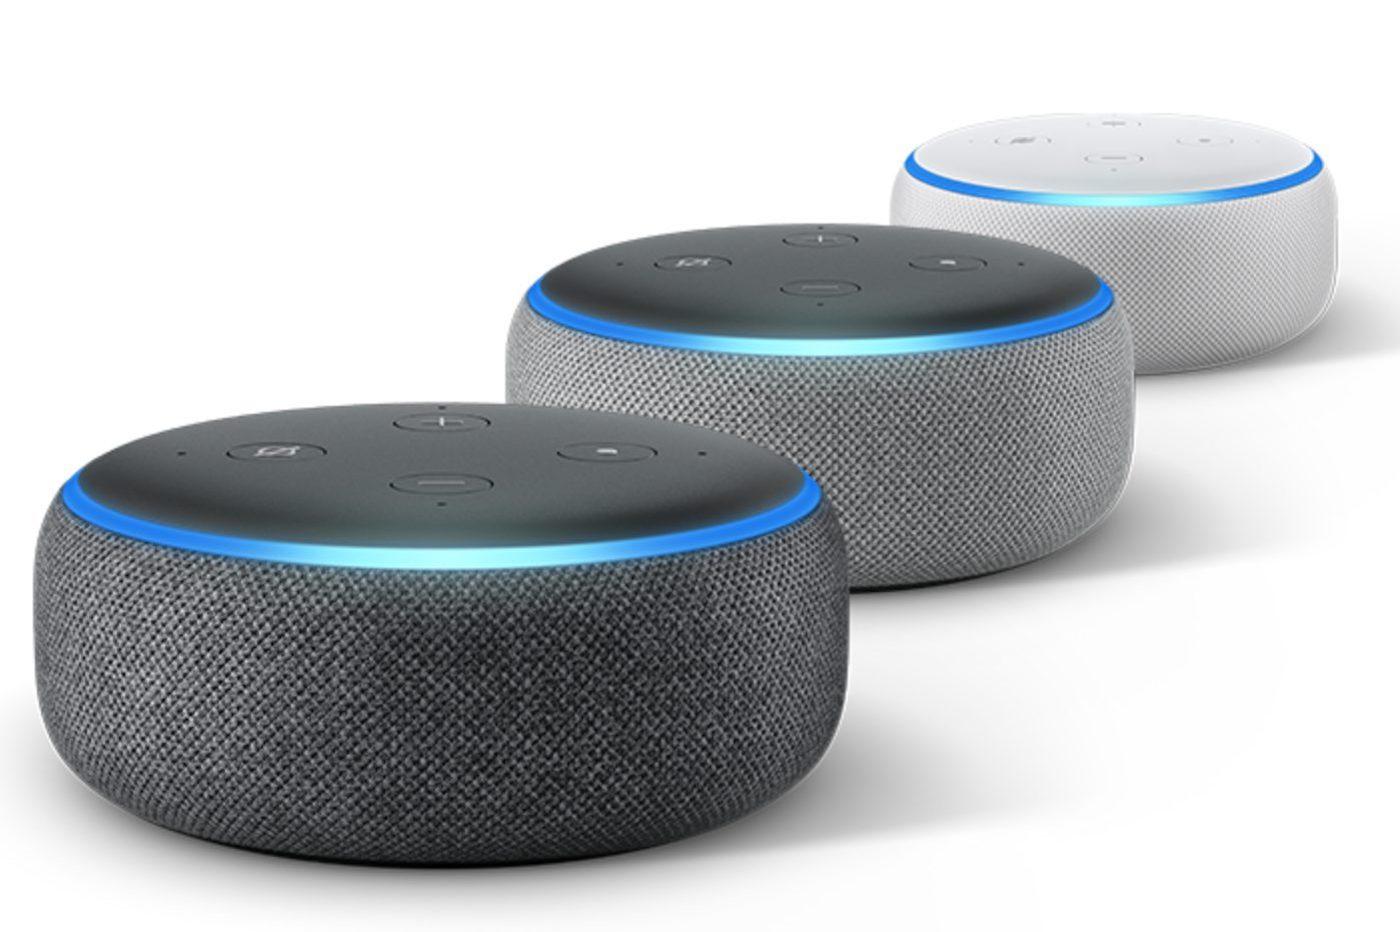 Amazon Echot Dot 3